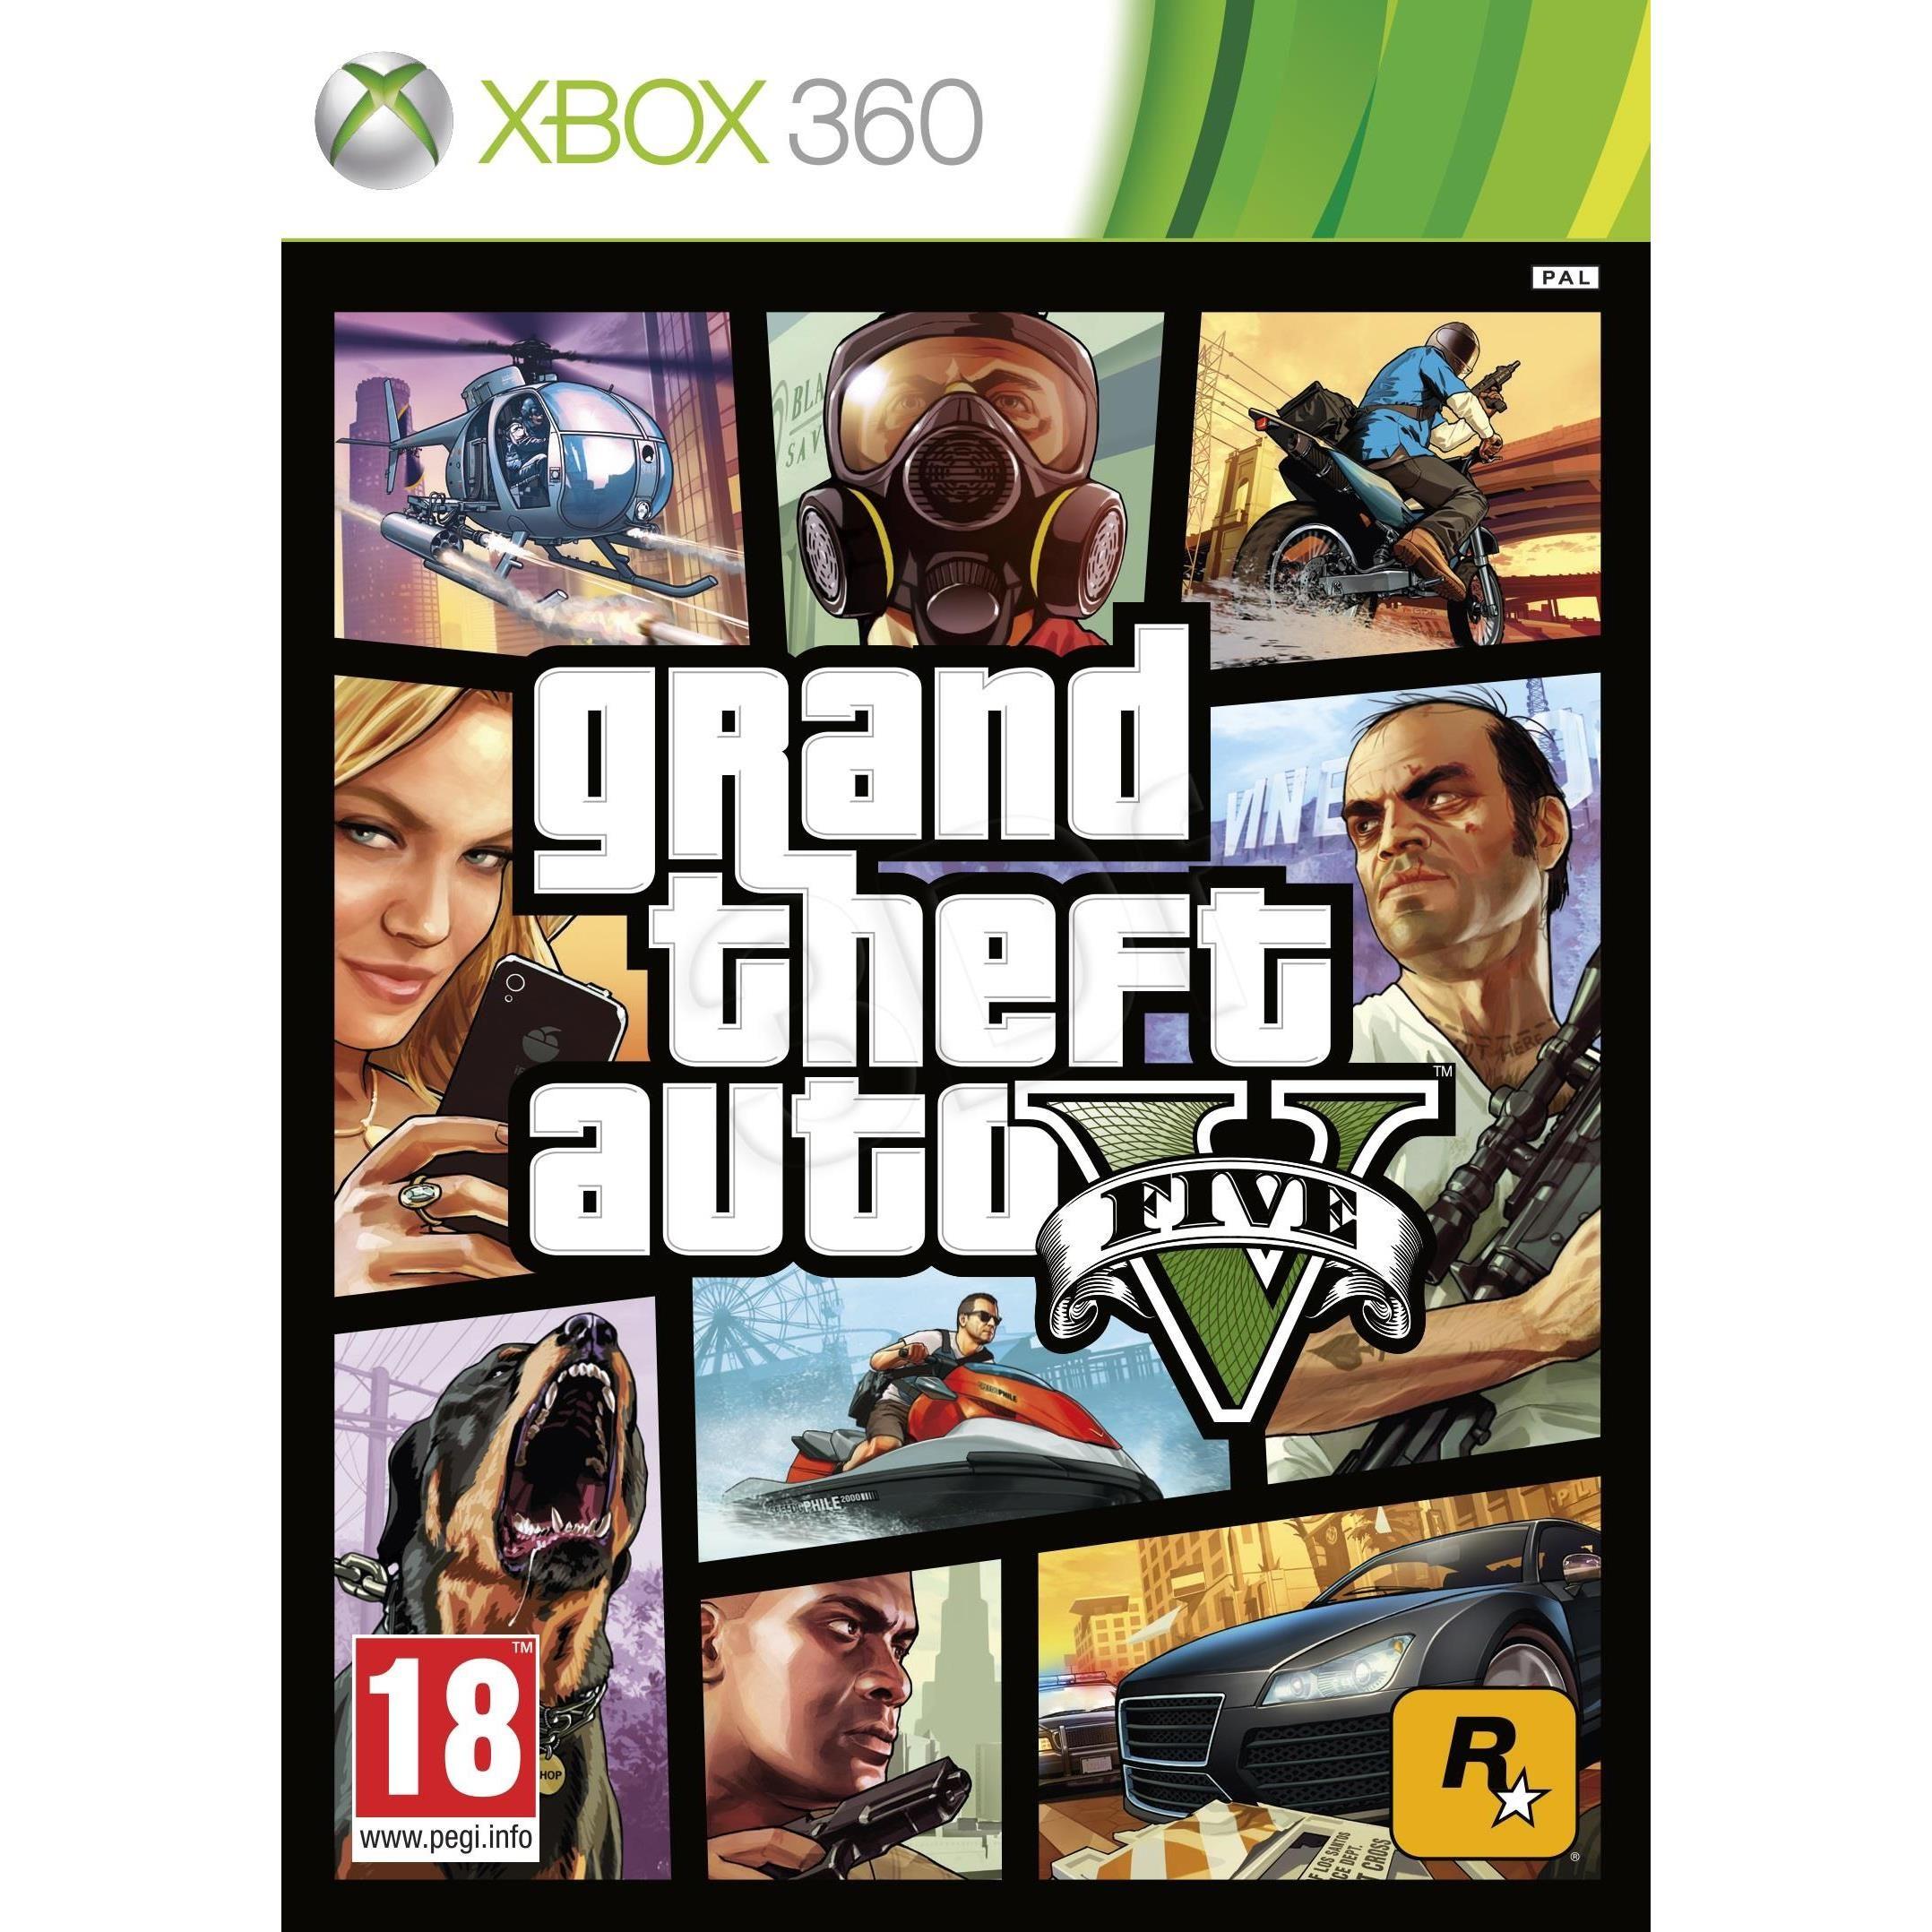 Gra Xbox 360 Grand Theft Auto V 6997665635 Oficjalne Archiwum Allegro